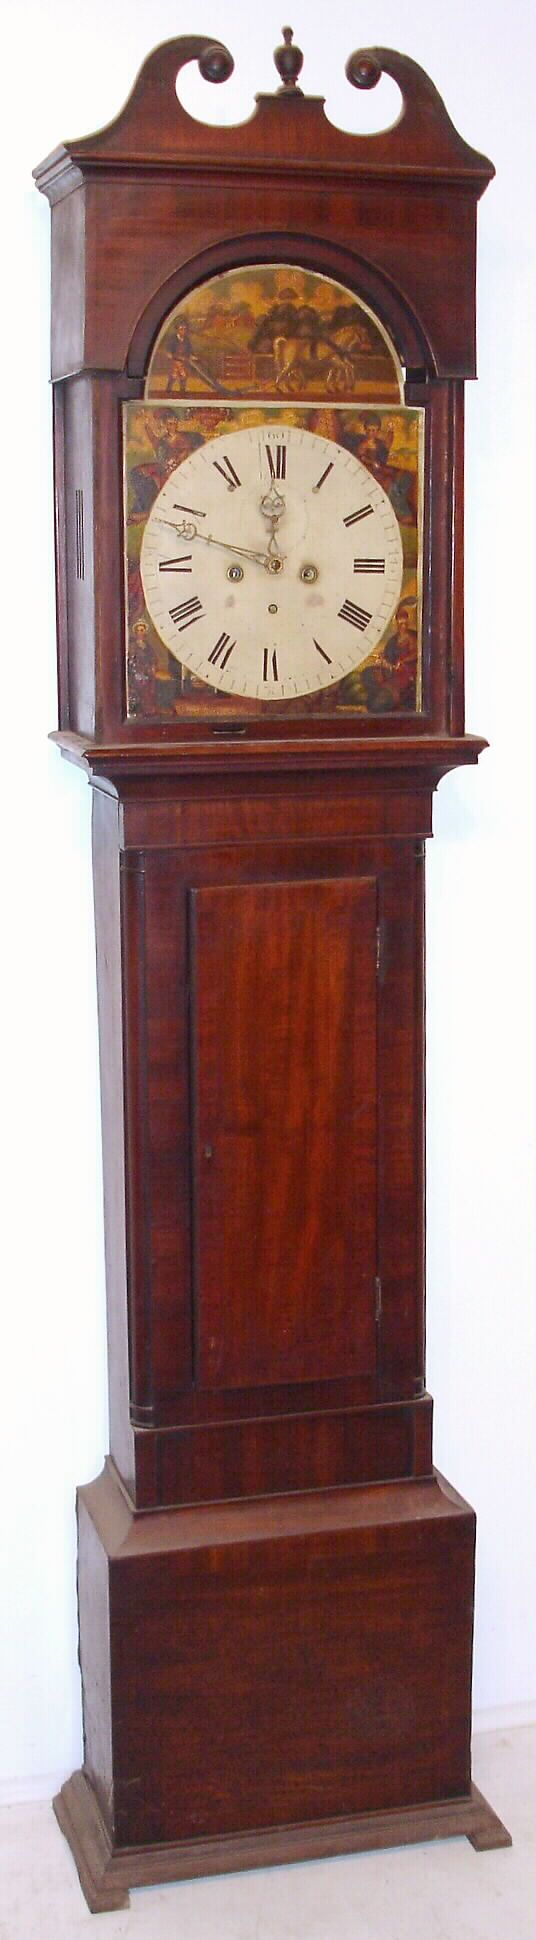 Antique Clock Details